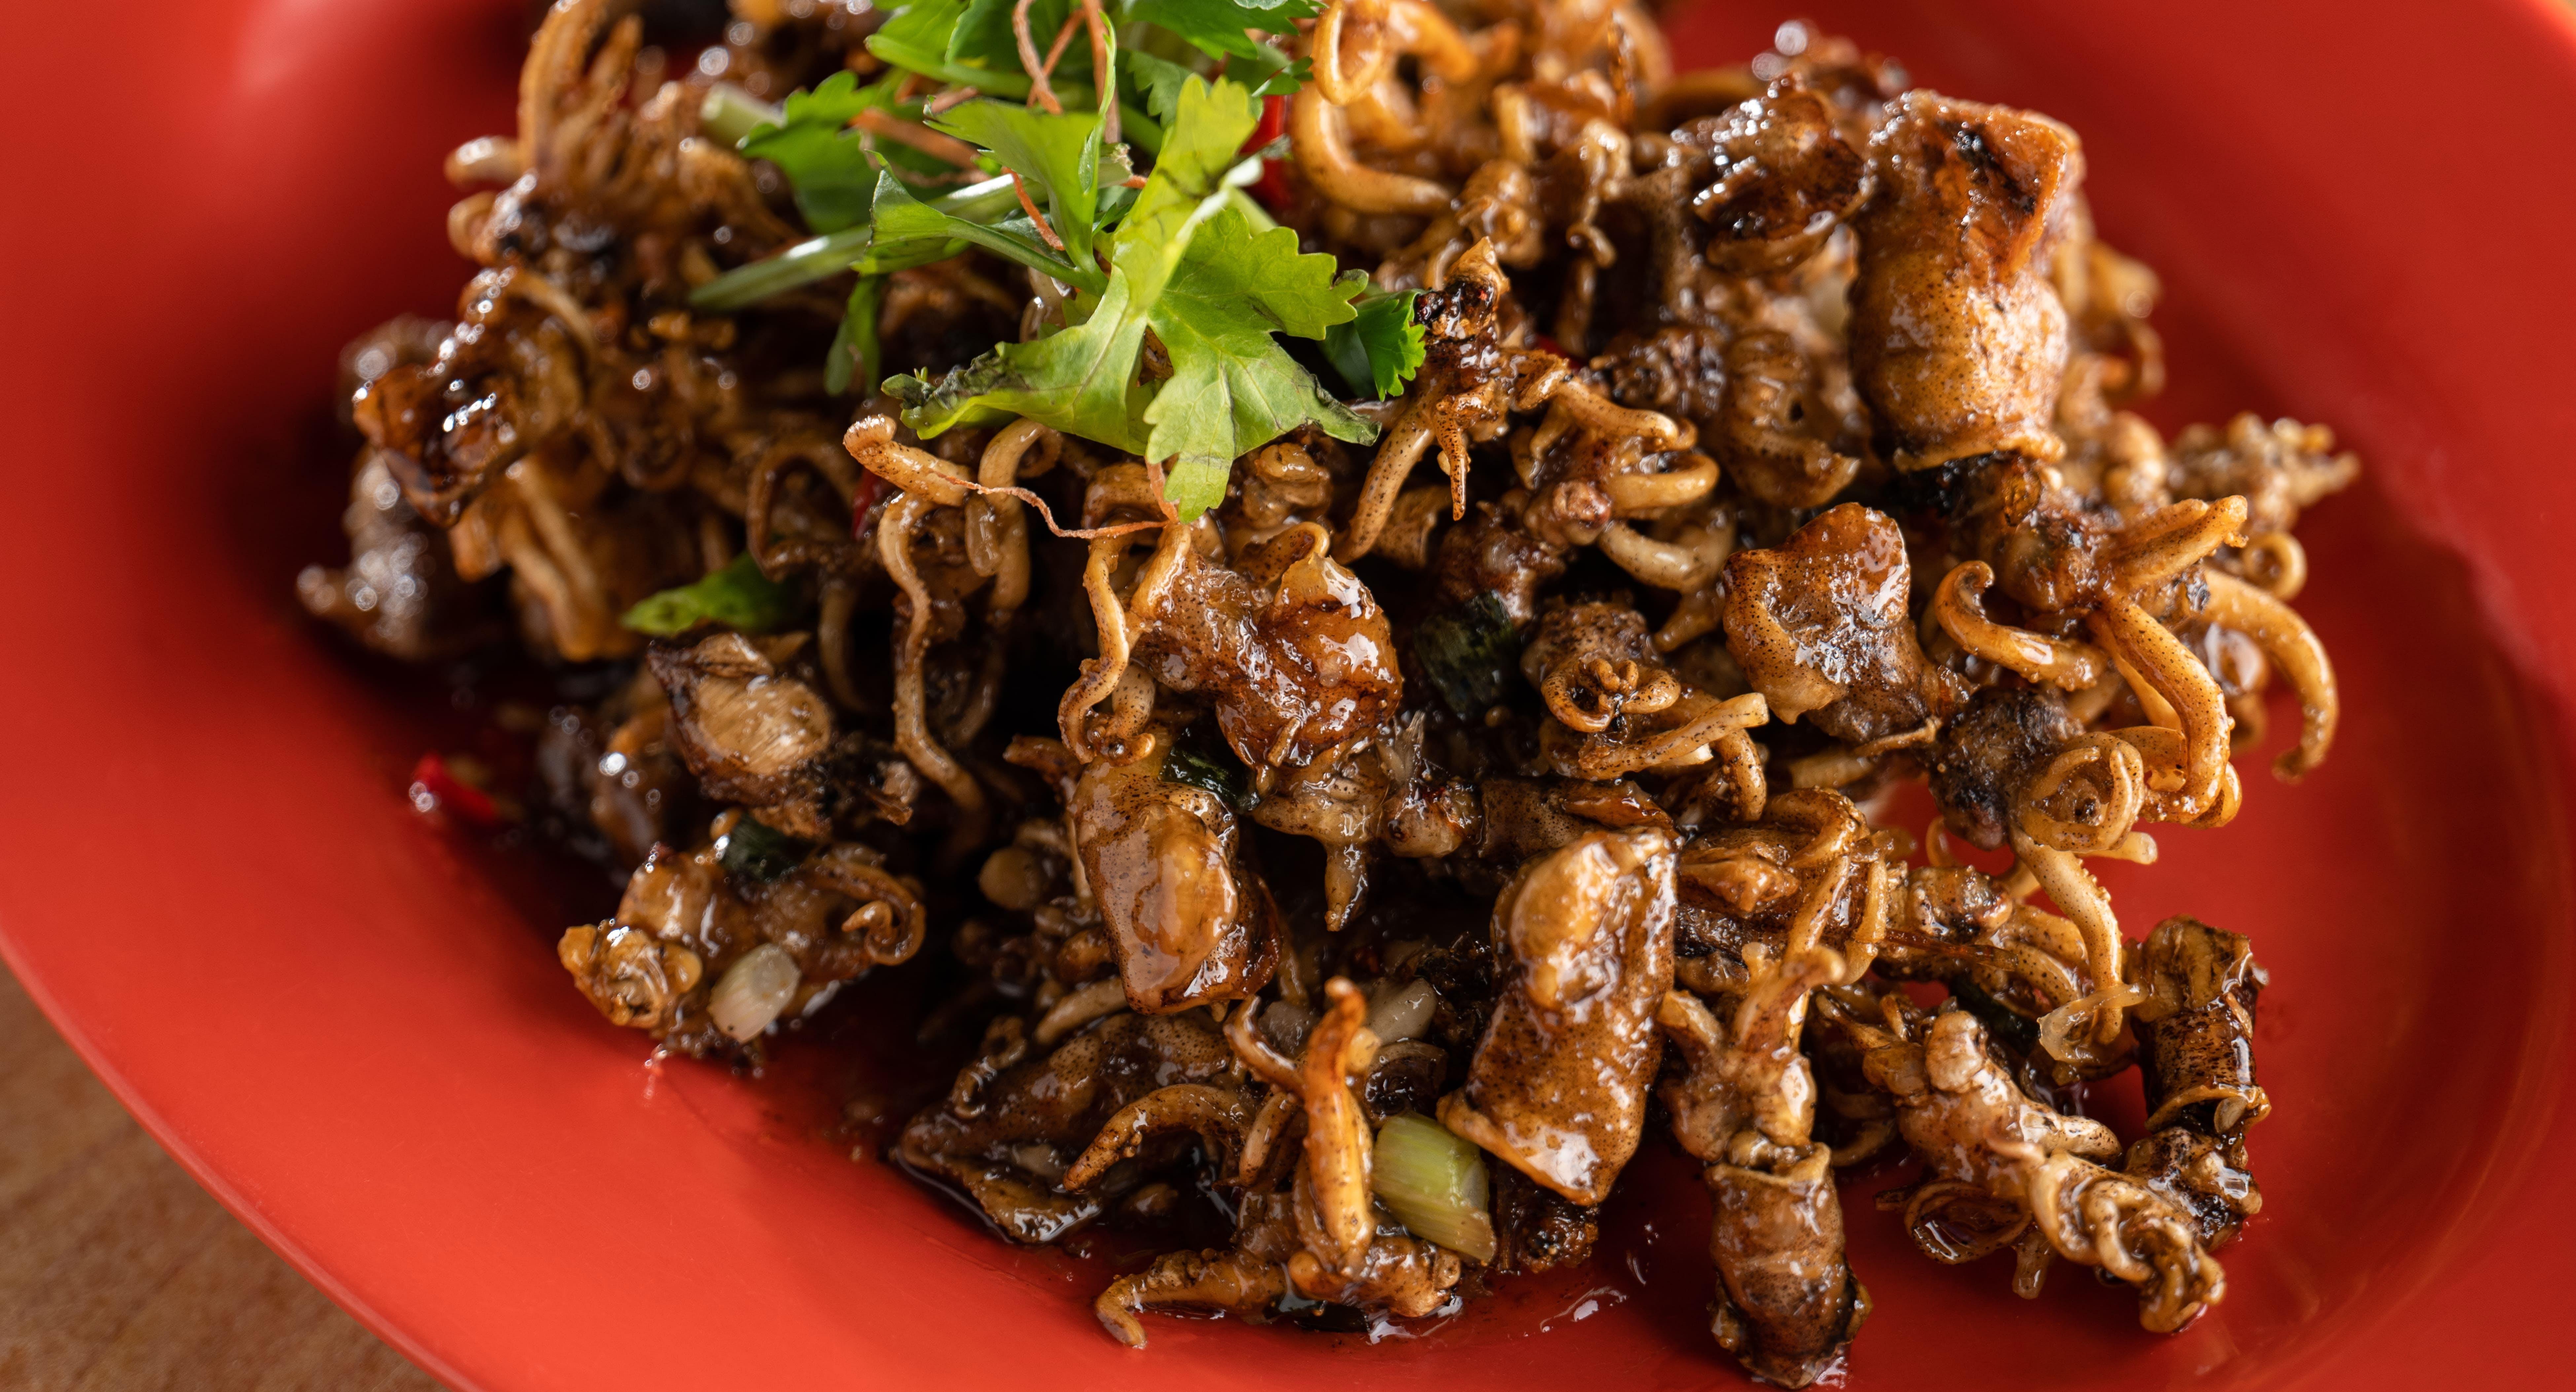 Ban Leong Wah Hoe Seafood Singapore image 3